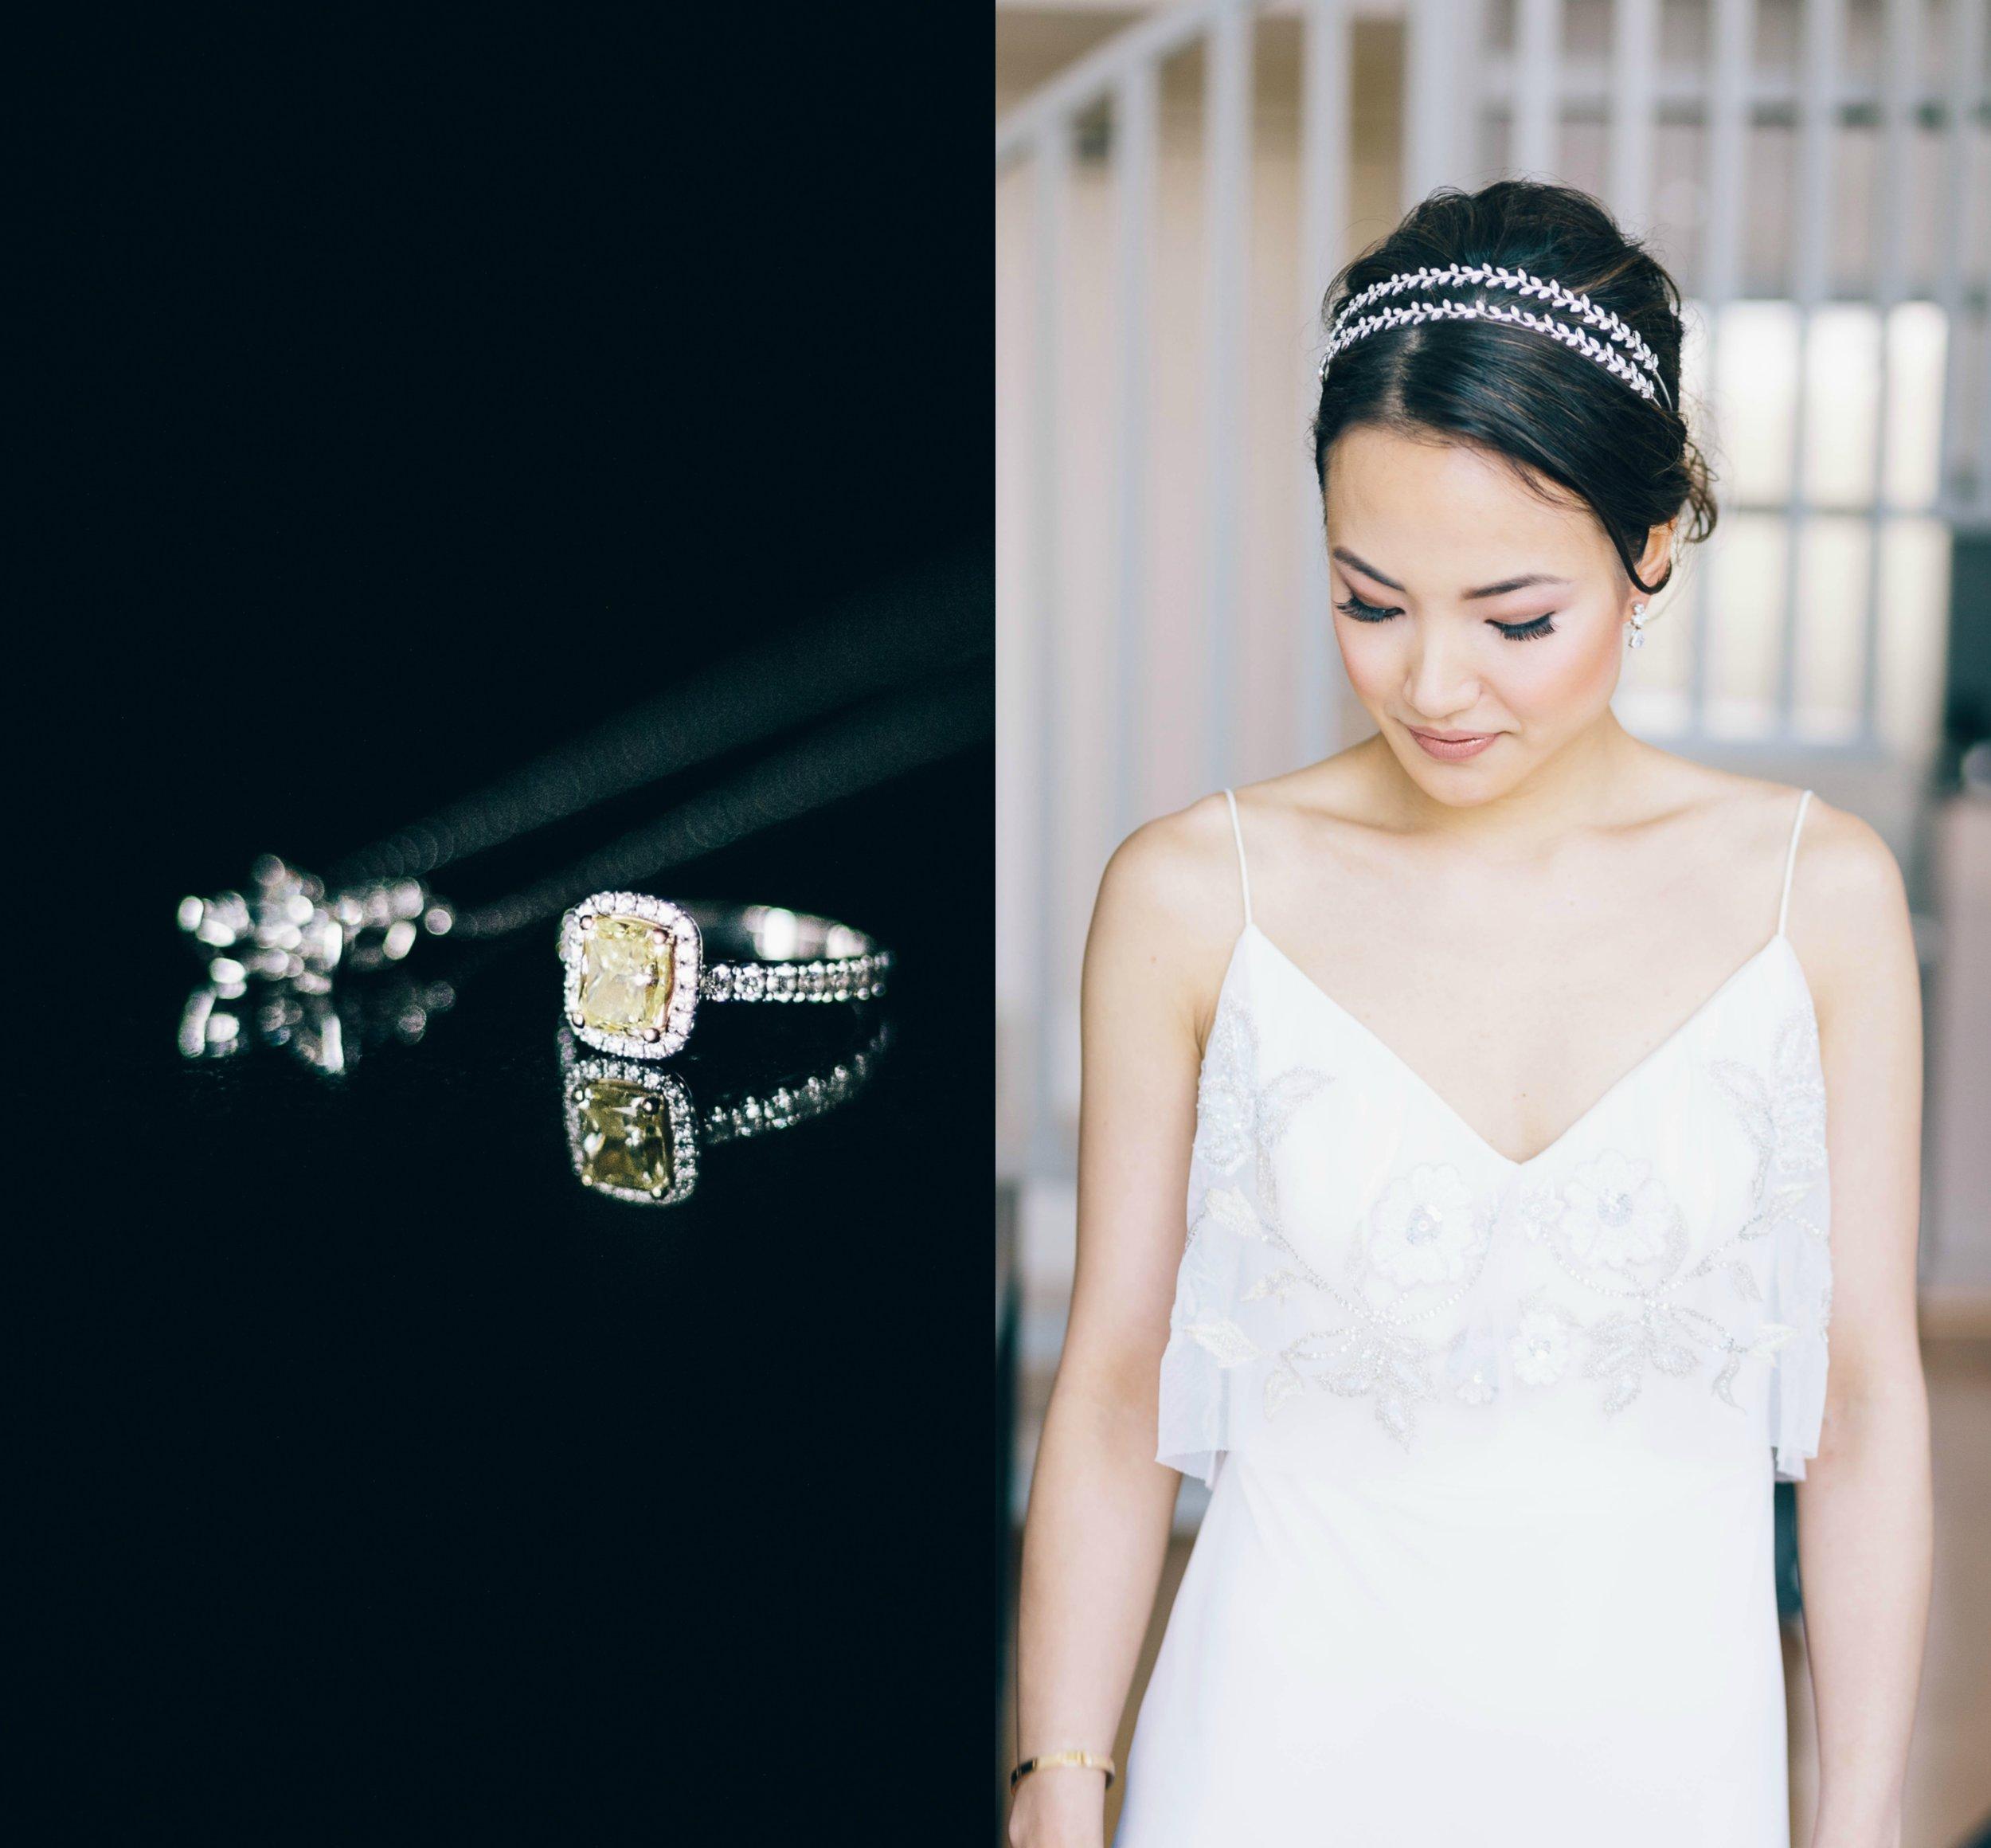 Westin Verasa Wedding at La Toque - JBJ Pictures Wedding Photographer in Napa Sonoma and San Francisco - 1 (3).jpg